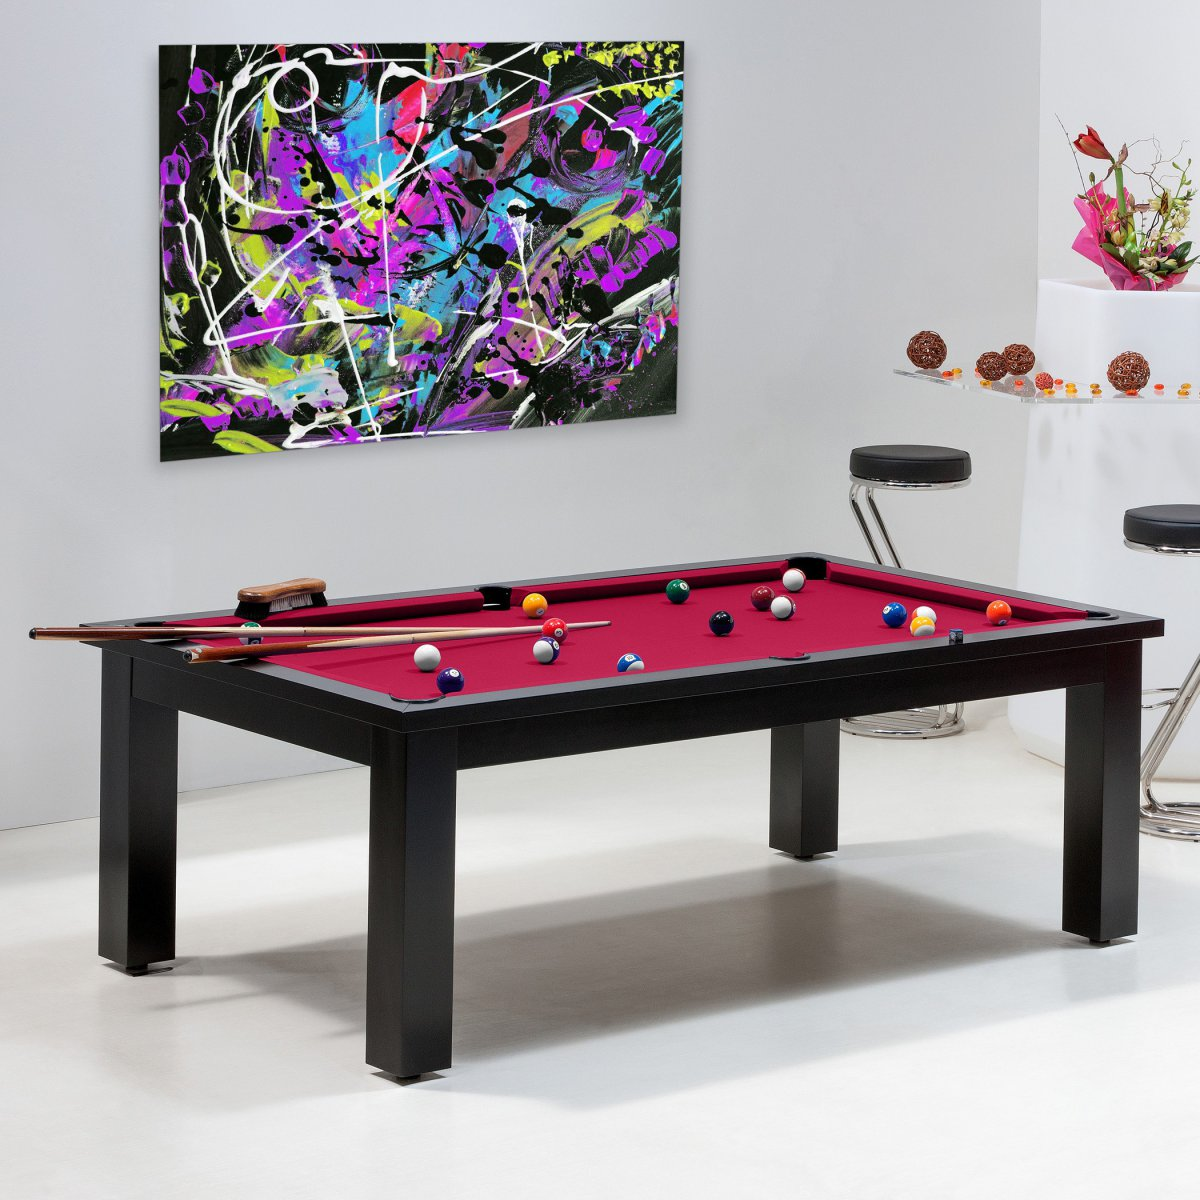 achat billard uniquement sur billards de france le miami. Black Bedroom Furniture Sets. Home Design Ideas